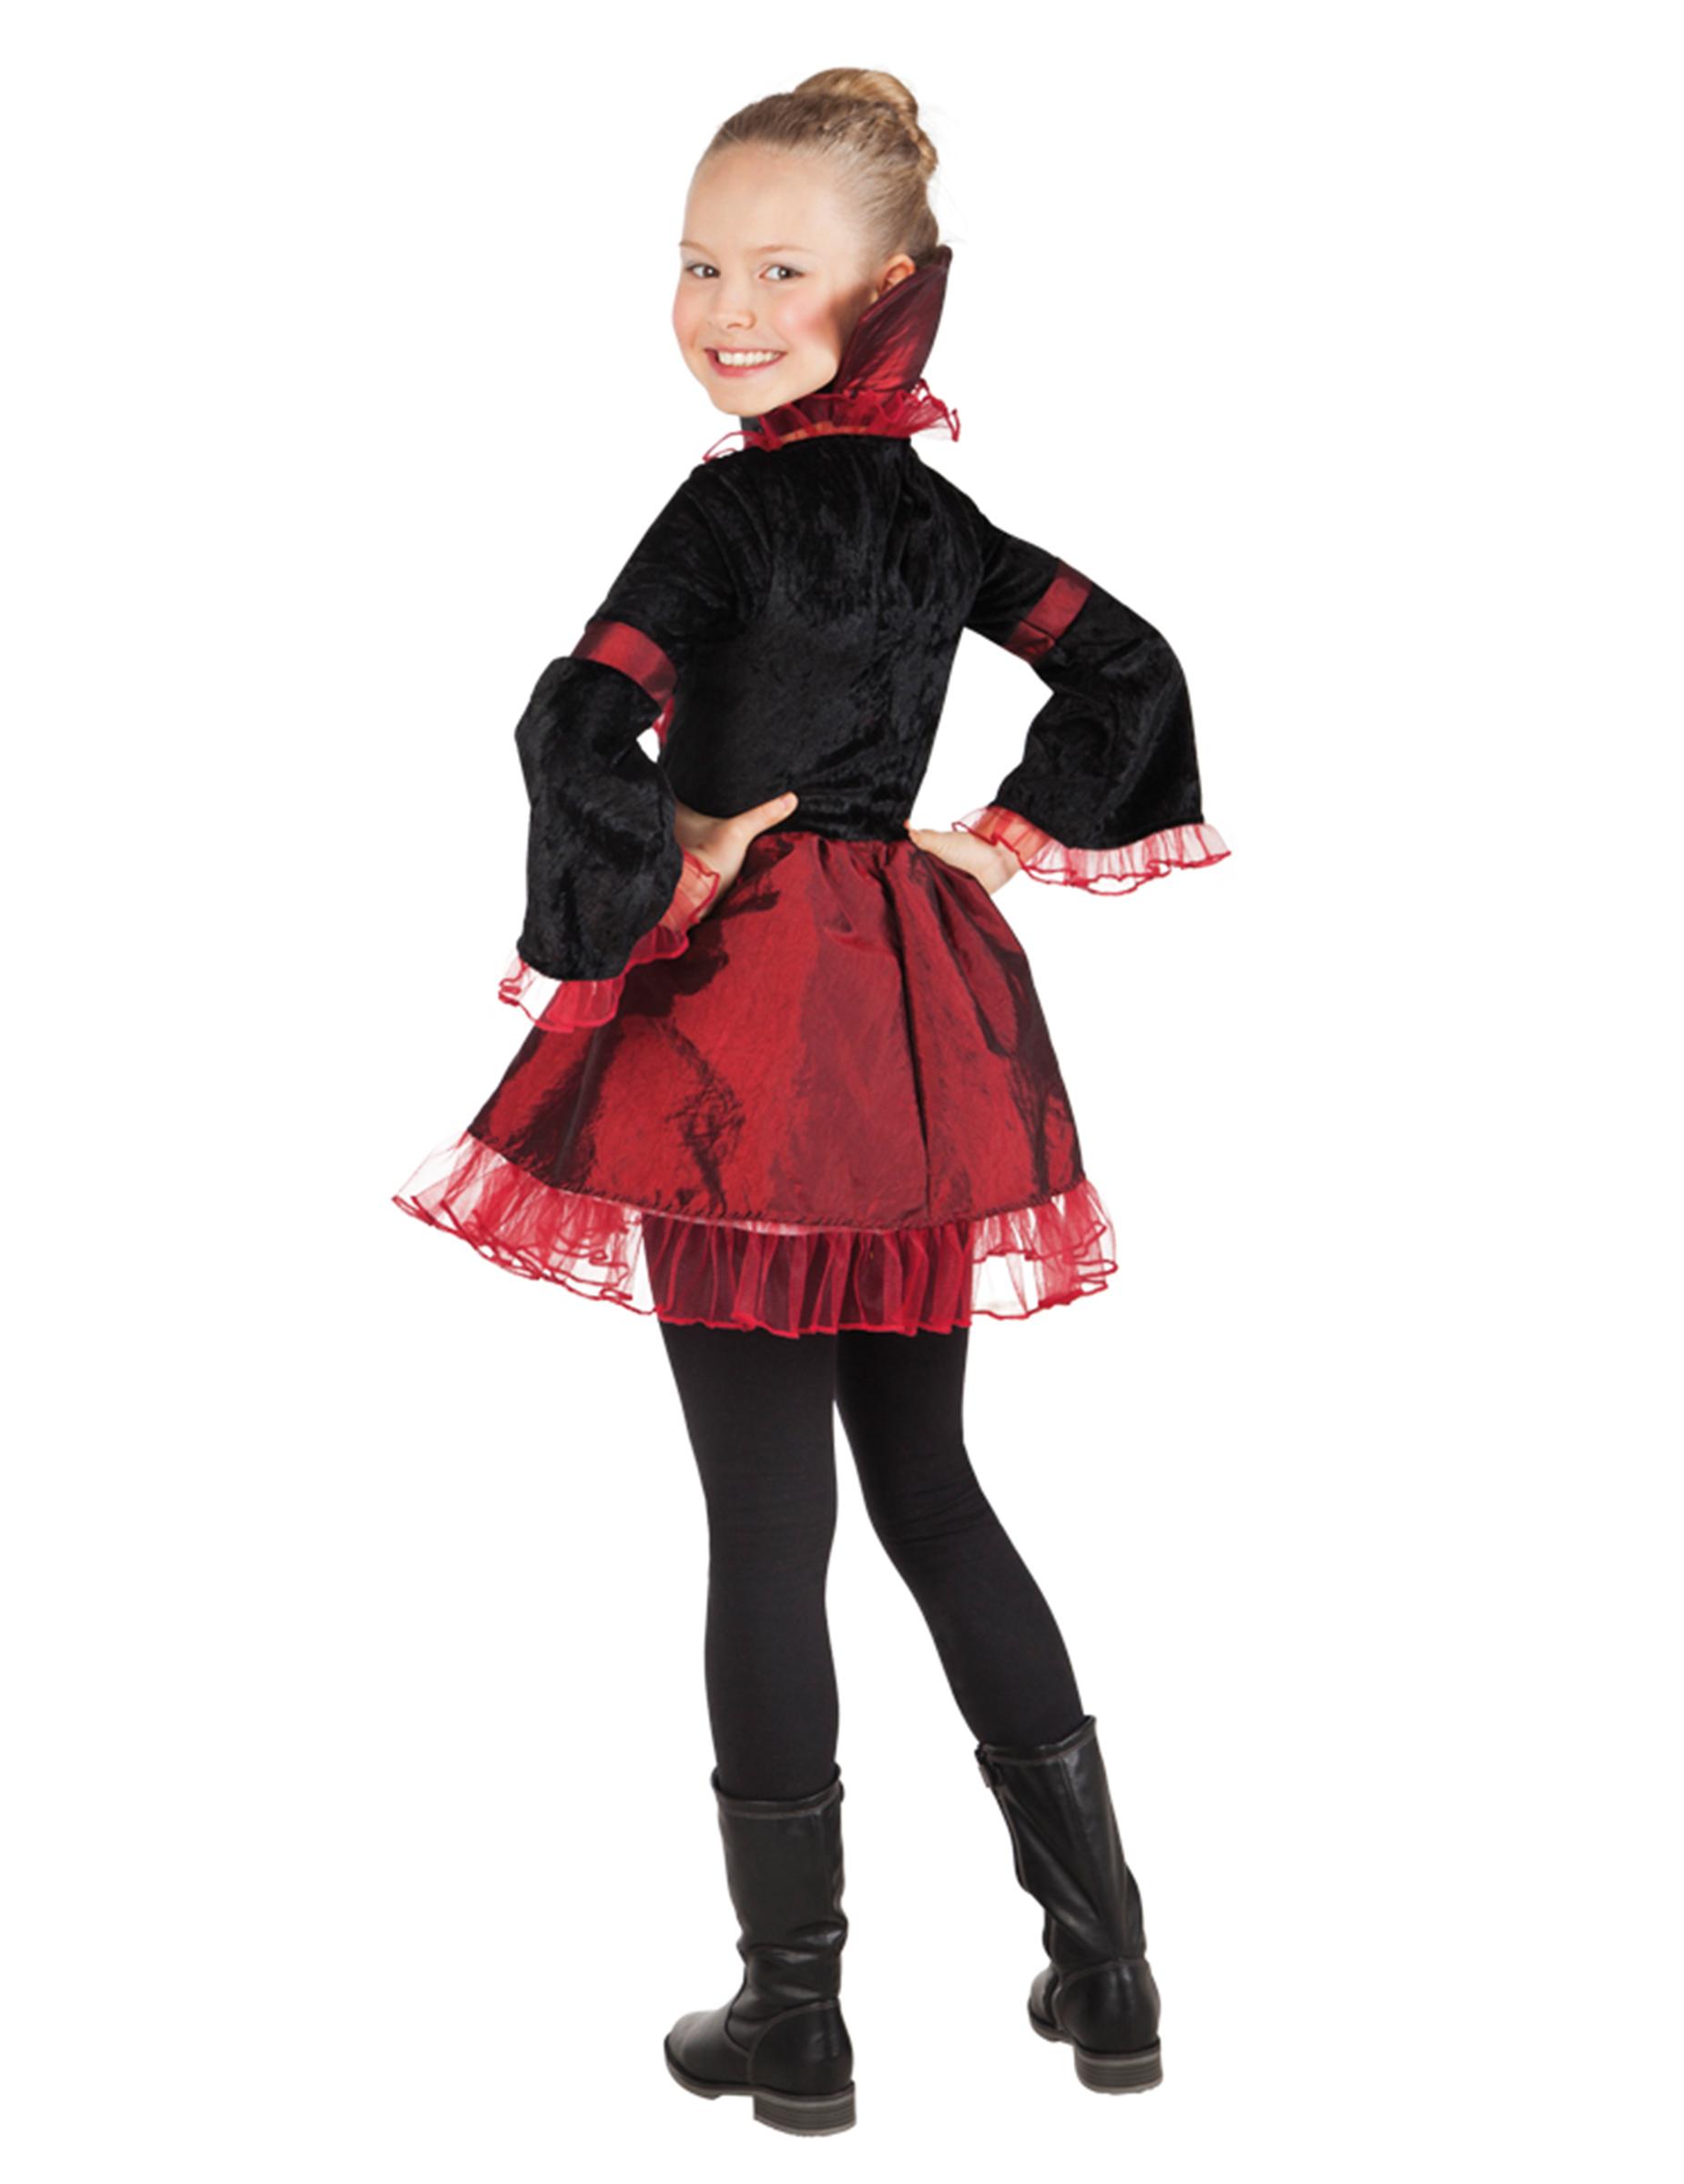 disfraces halloween niños ideas